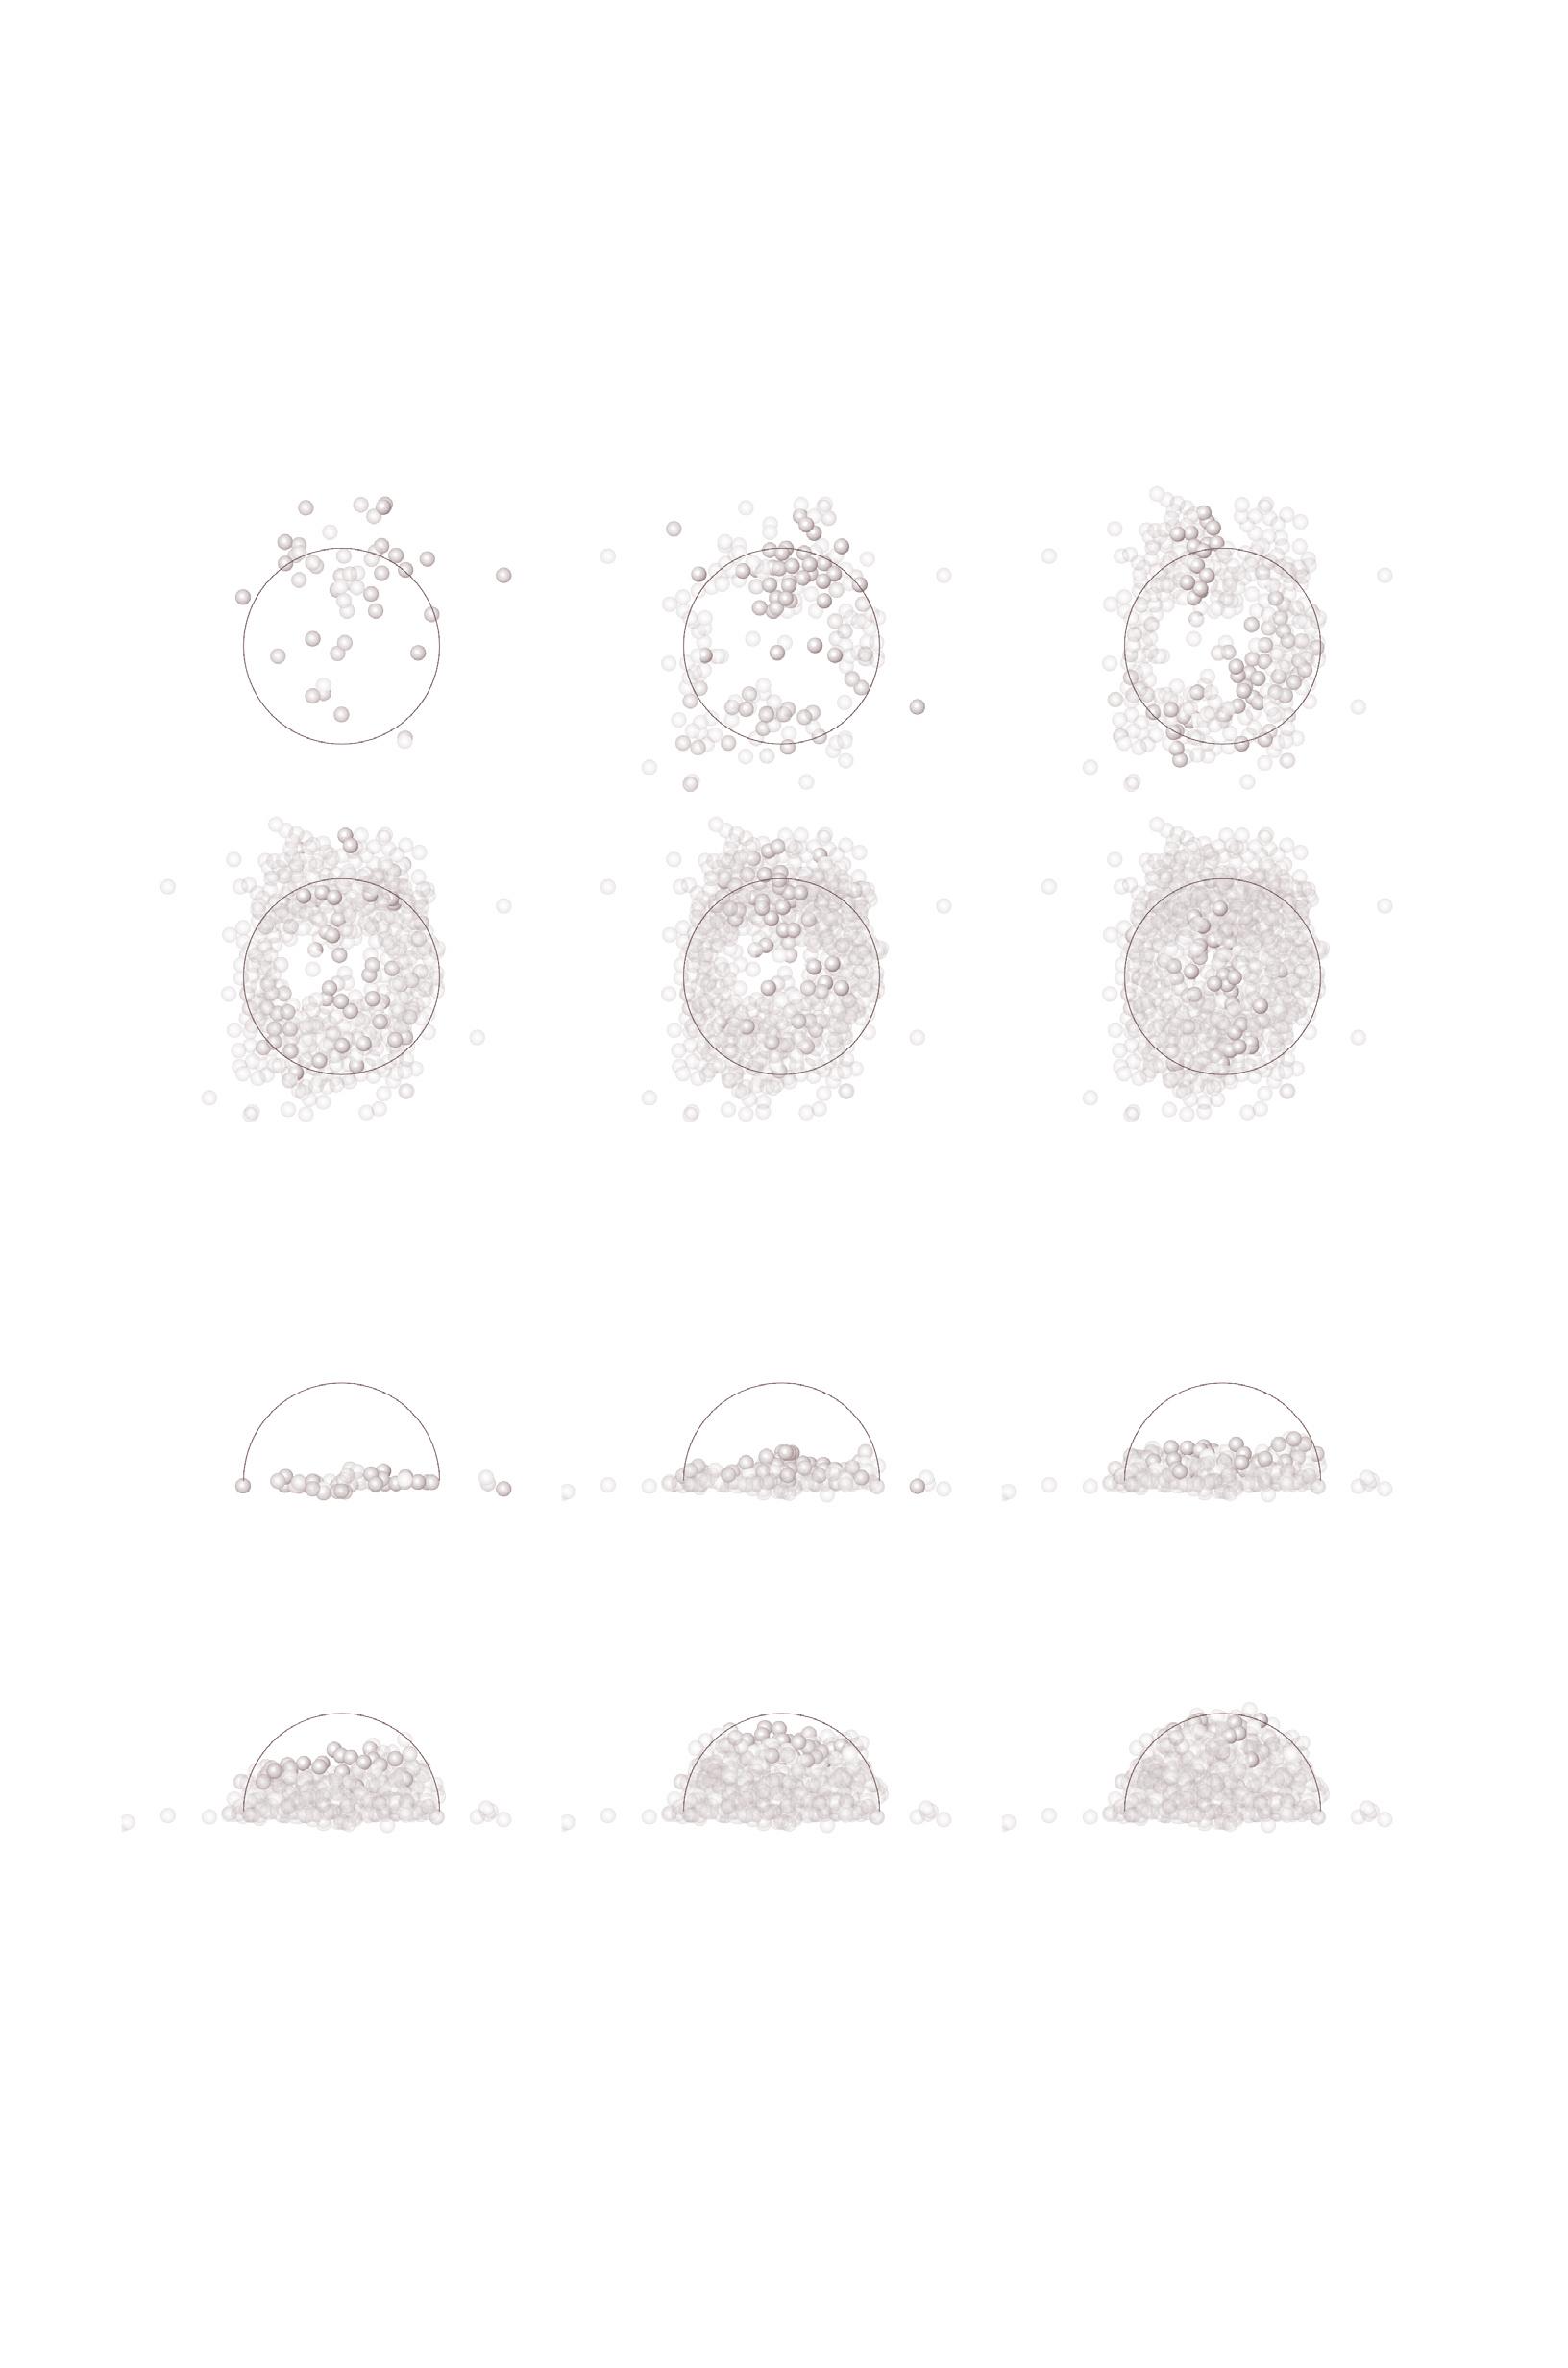 140515_179_Diagramm_002_PR